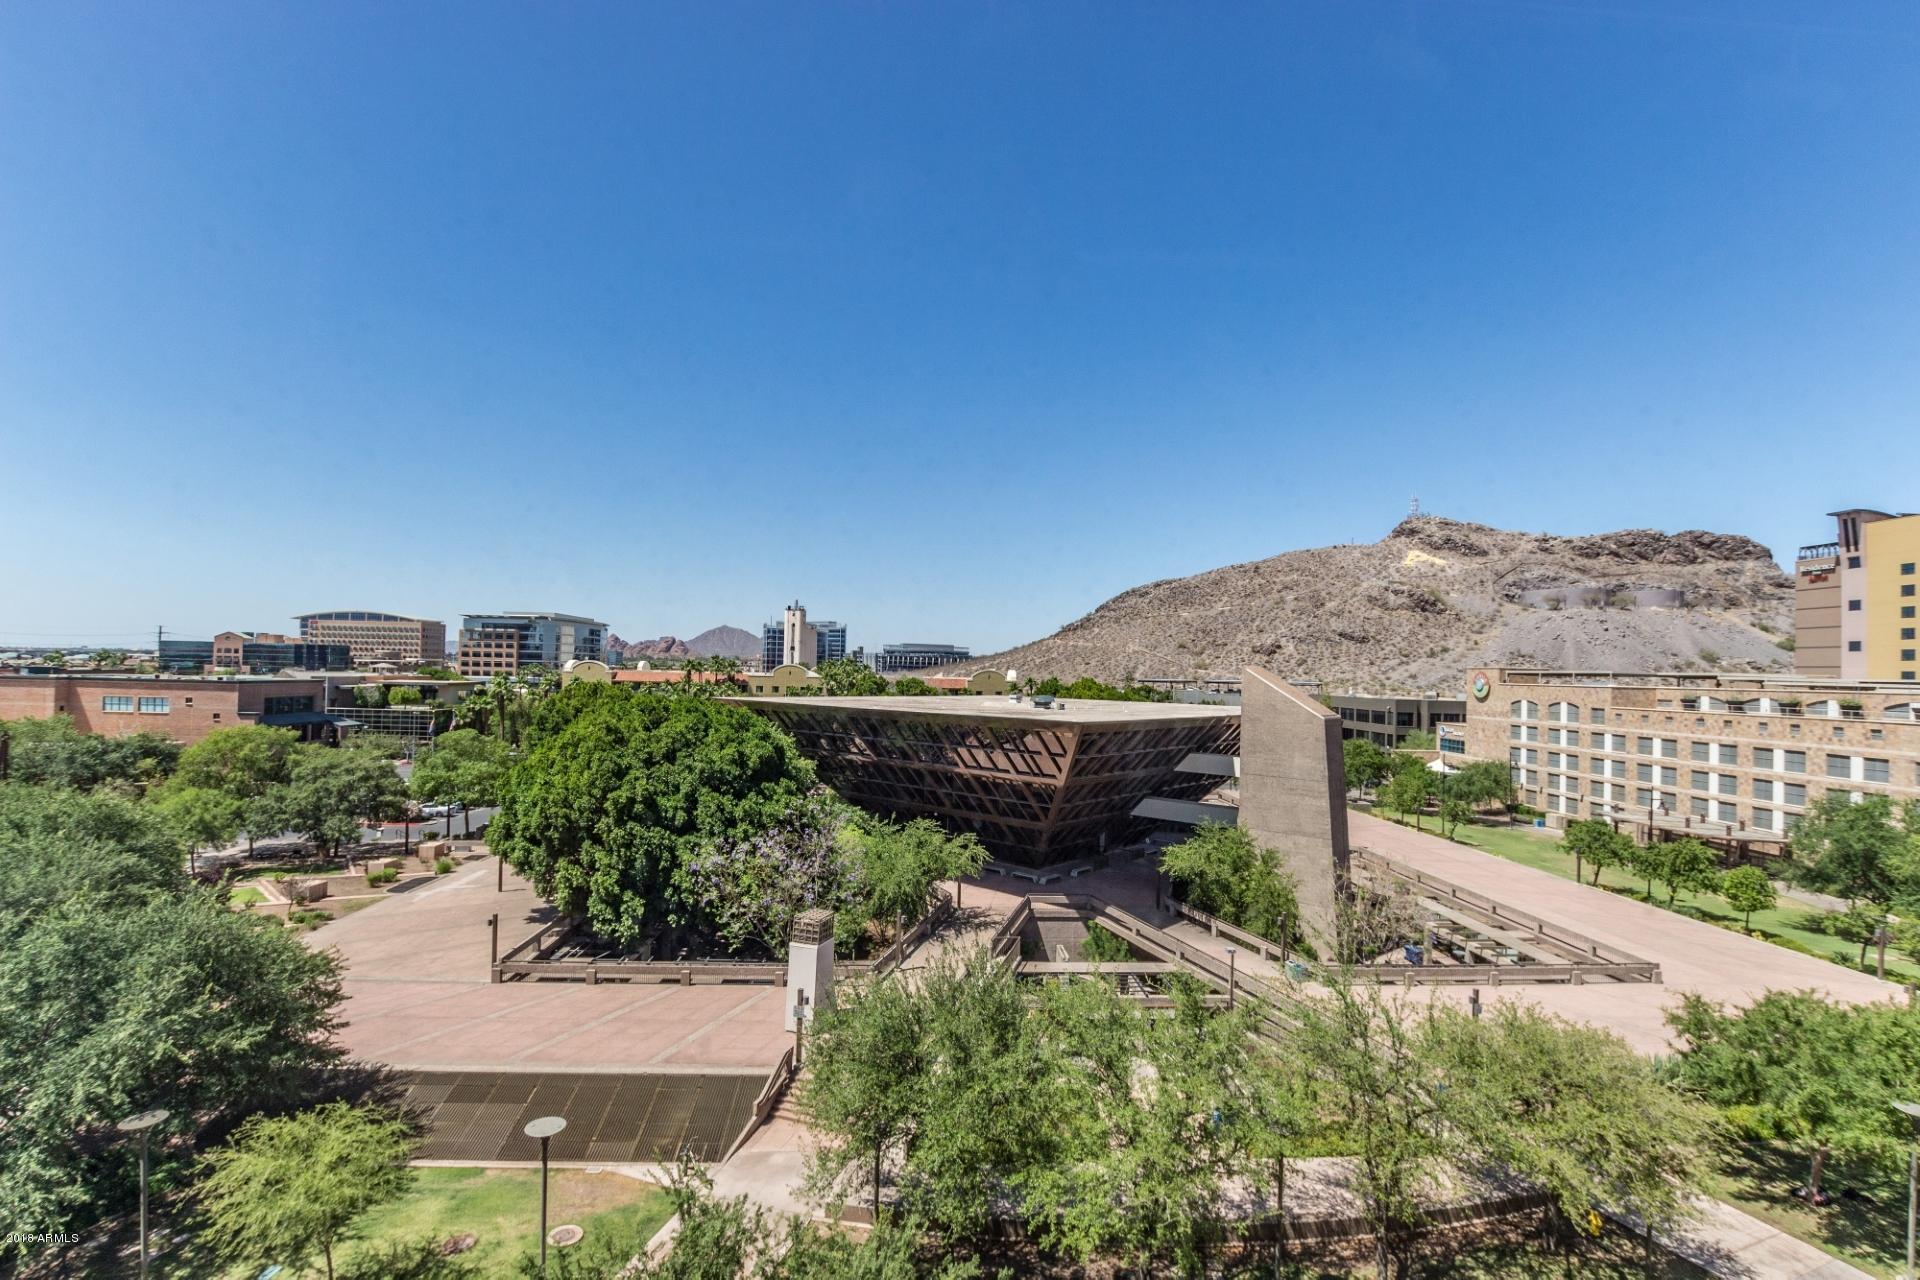 MLS 5960503 21 E 6TH Street Unit 503, Tempe, AZ 85281 Tempe AZ High Rise